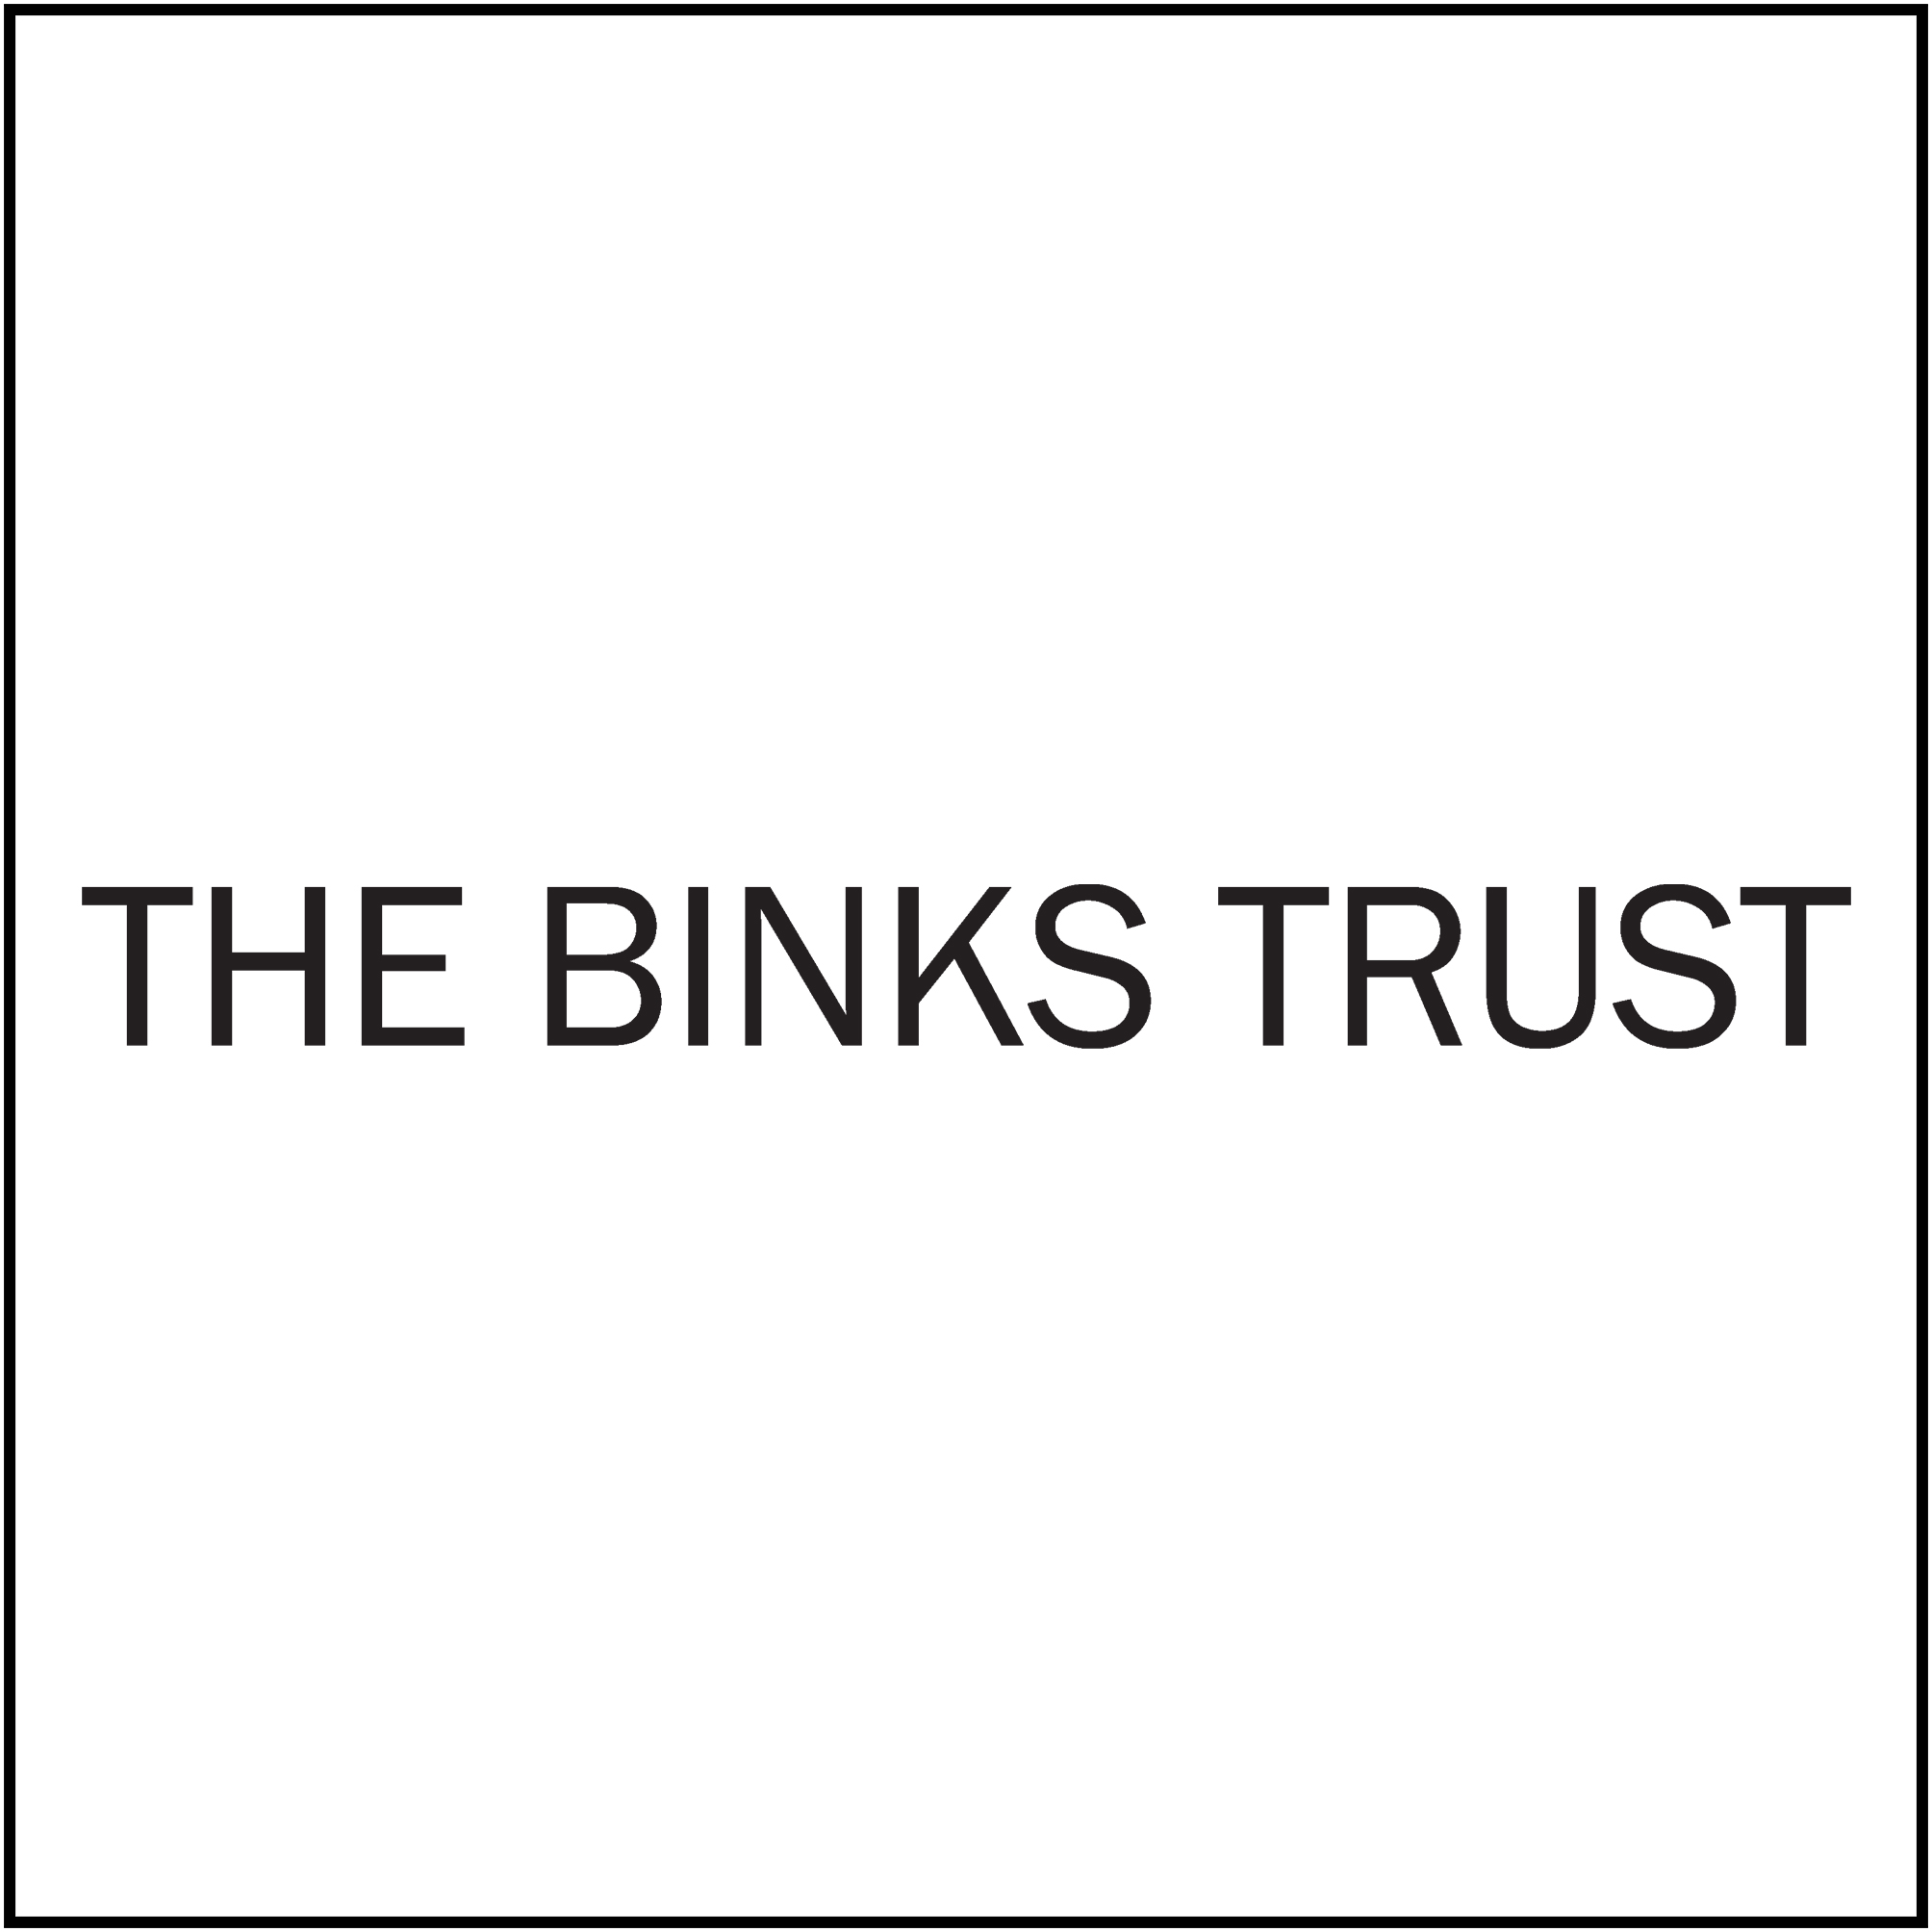 Binks Trust logo